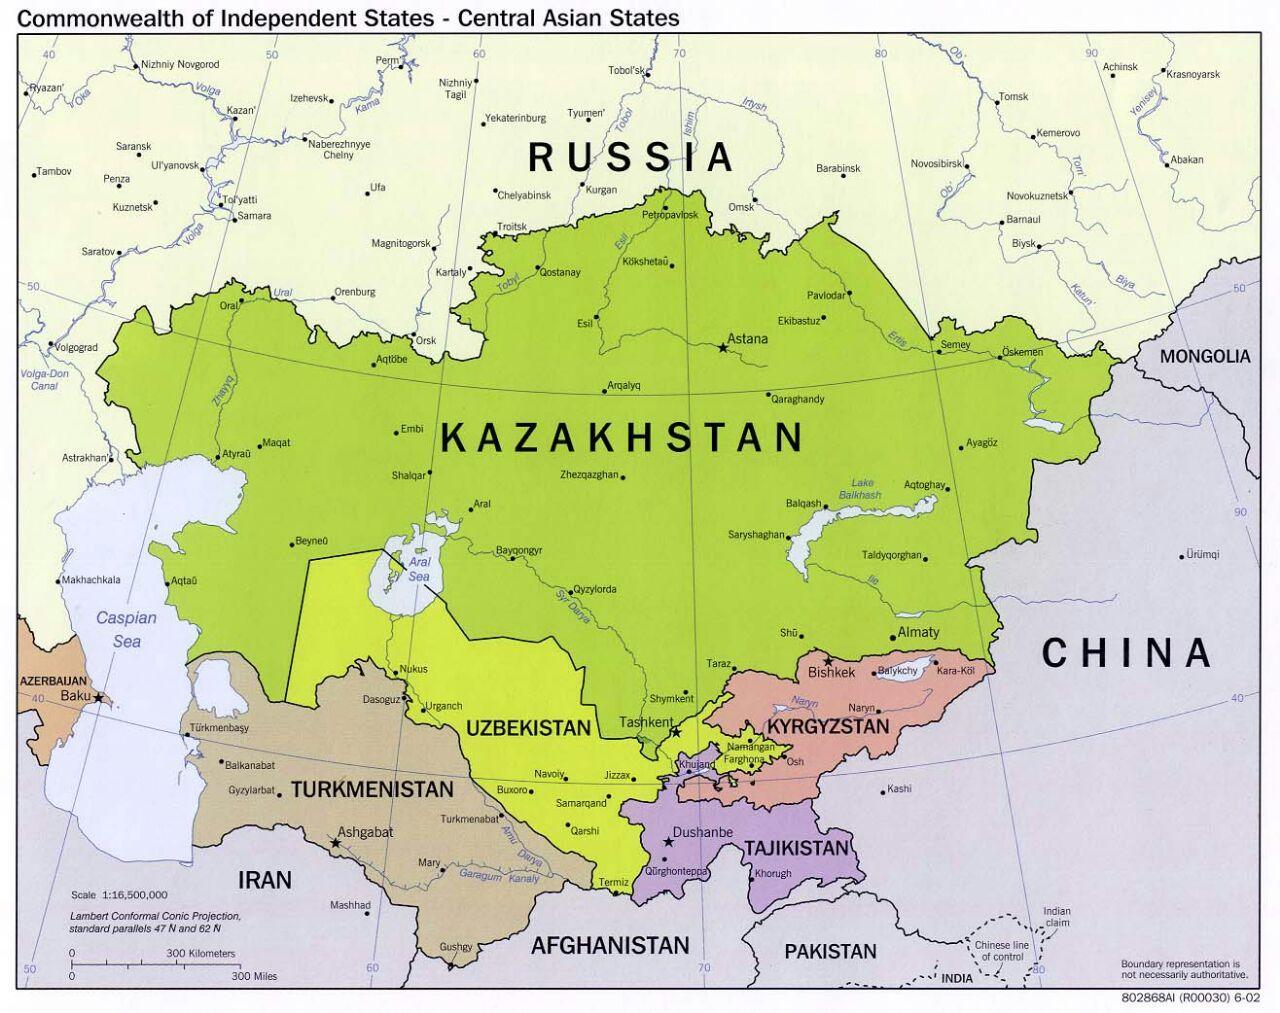 Landkarte Asien.Usbekistan Karte Asien Usbekistan Russland Karte Zentral